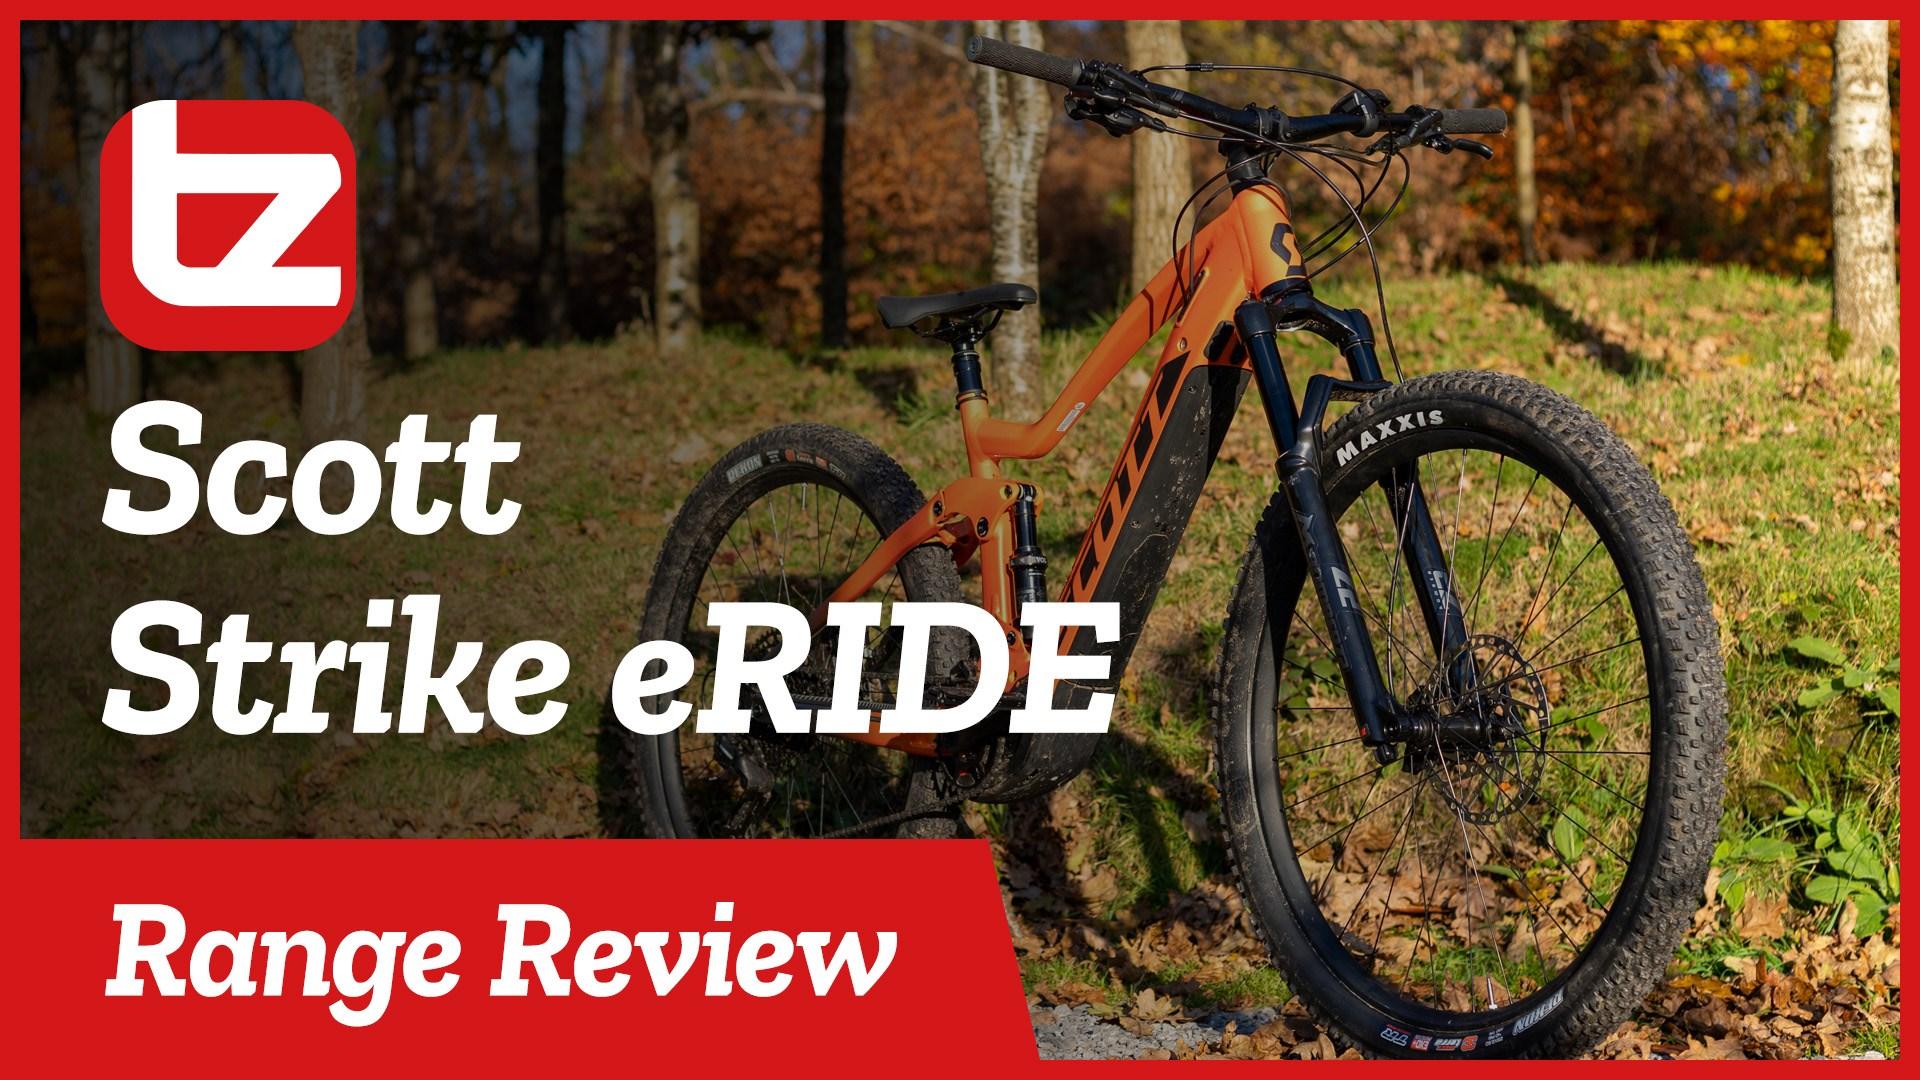 Scott Strike eRide   Range Review   Tredz Bikes